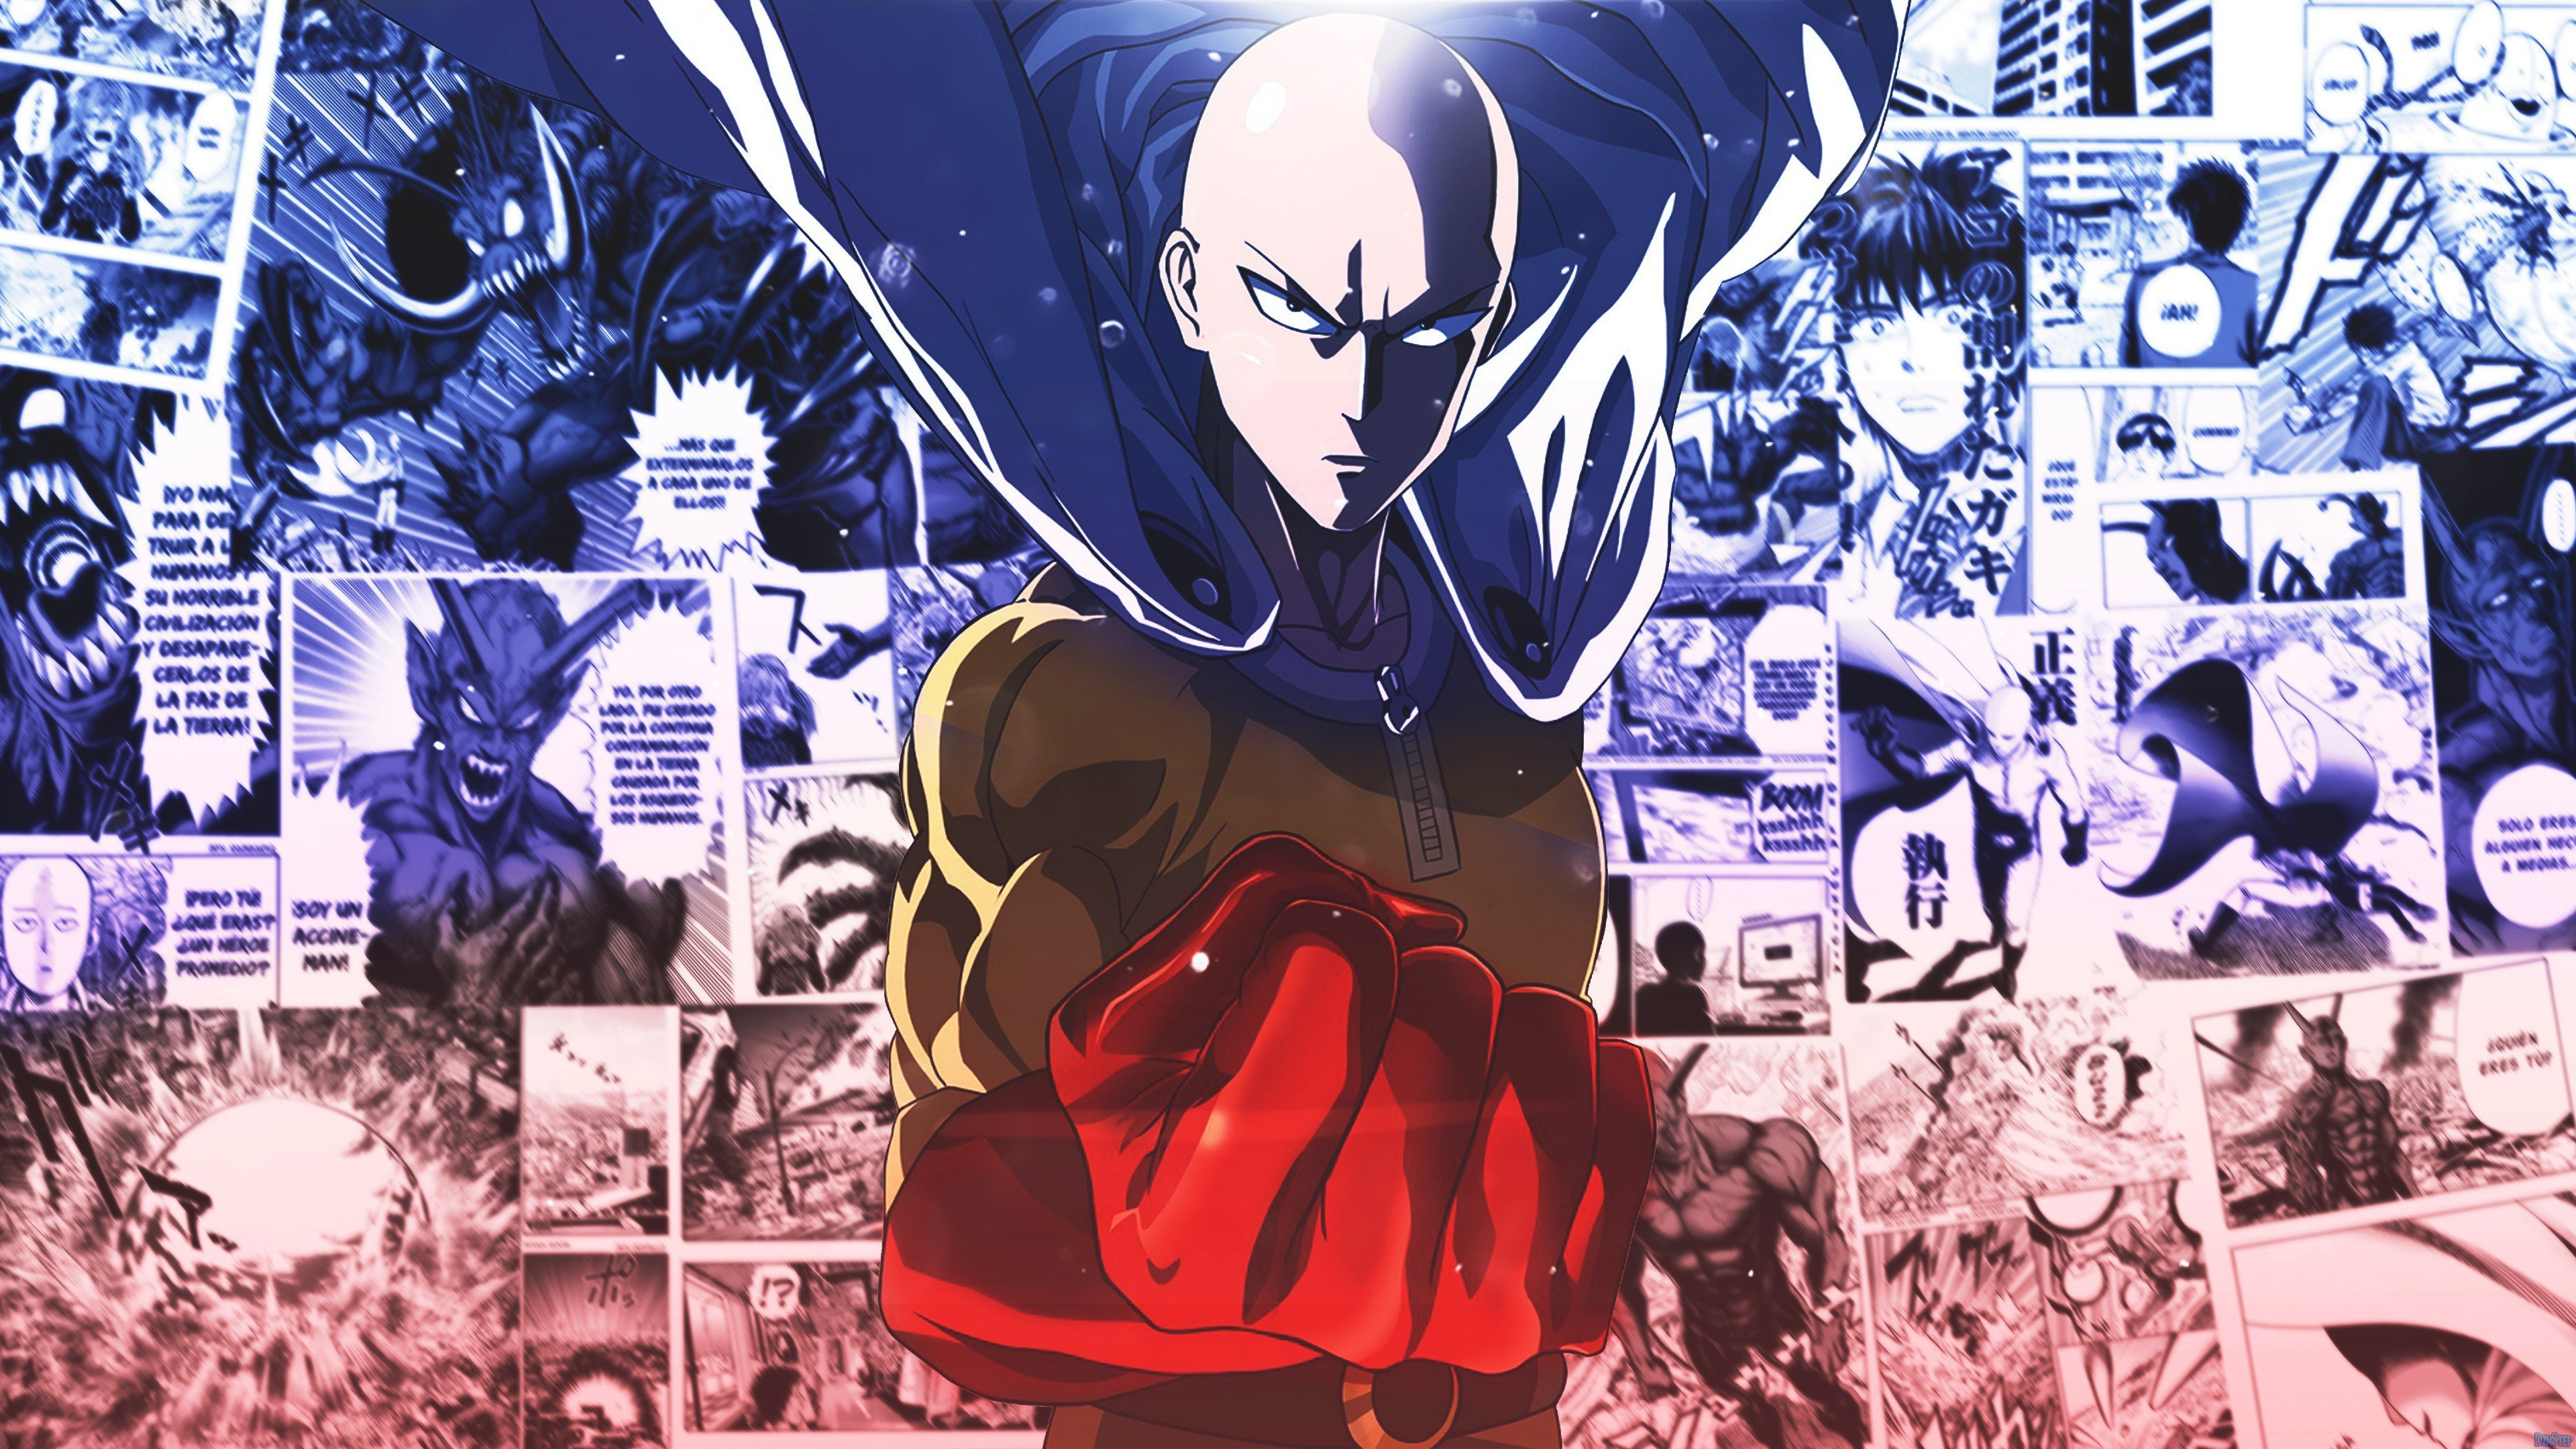 Download 3840x2160 Wallpaper Saitama Onepunch Man Anime